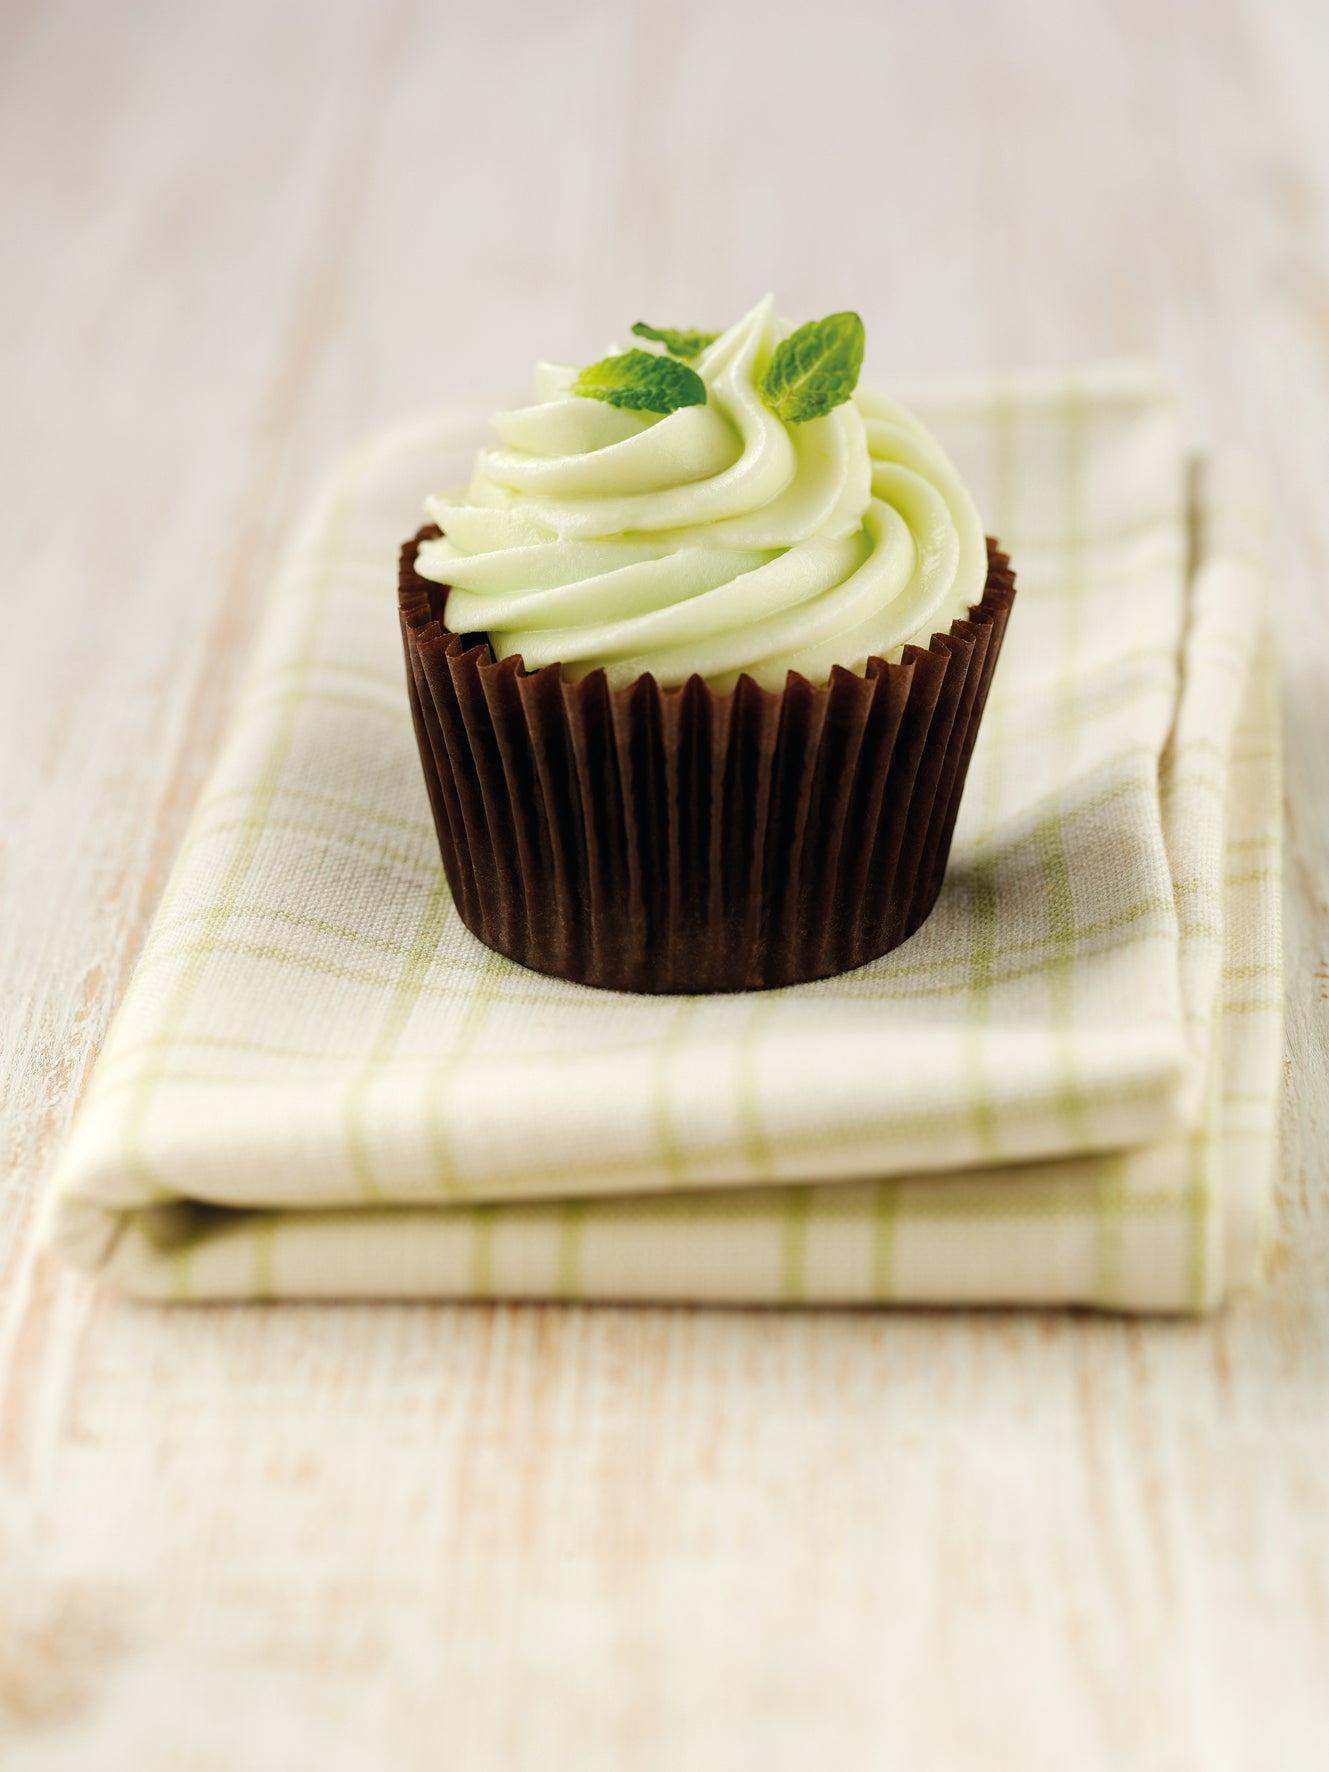 Nielsen-Massey-Peppermint-Cupcake.jpg